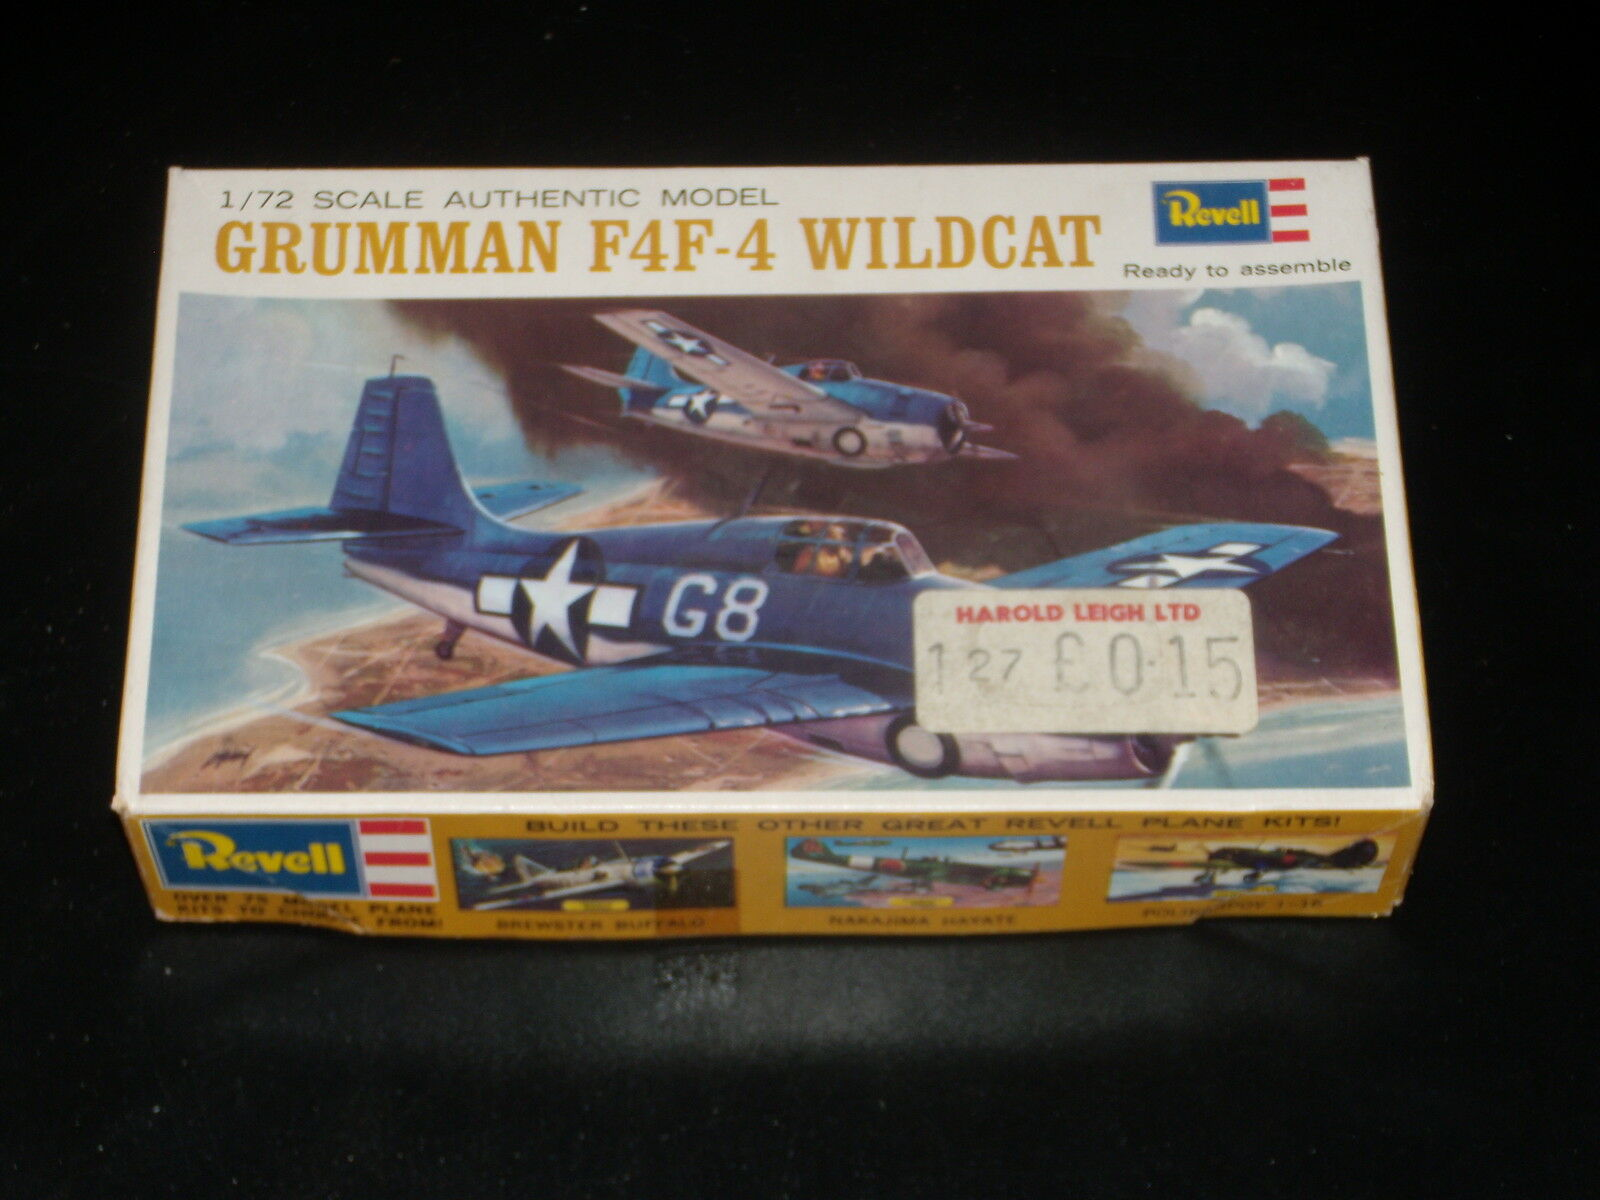 MODELL - GRUMMAN F4F-4 WILDCAT WILDCAT WILDCAT - REVELL - 1 72 - 1965 - SET - VOLLSTÄNDIGES f0613d